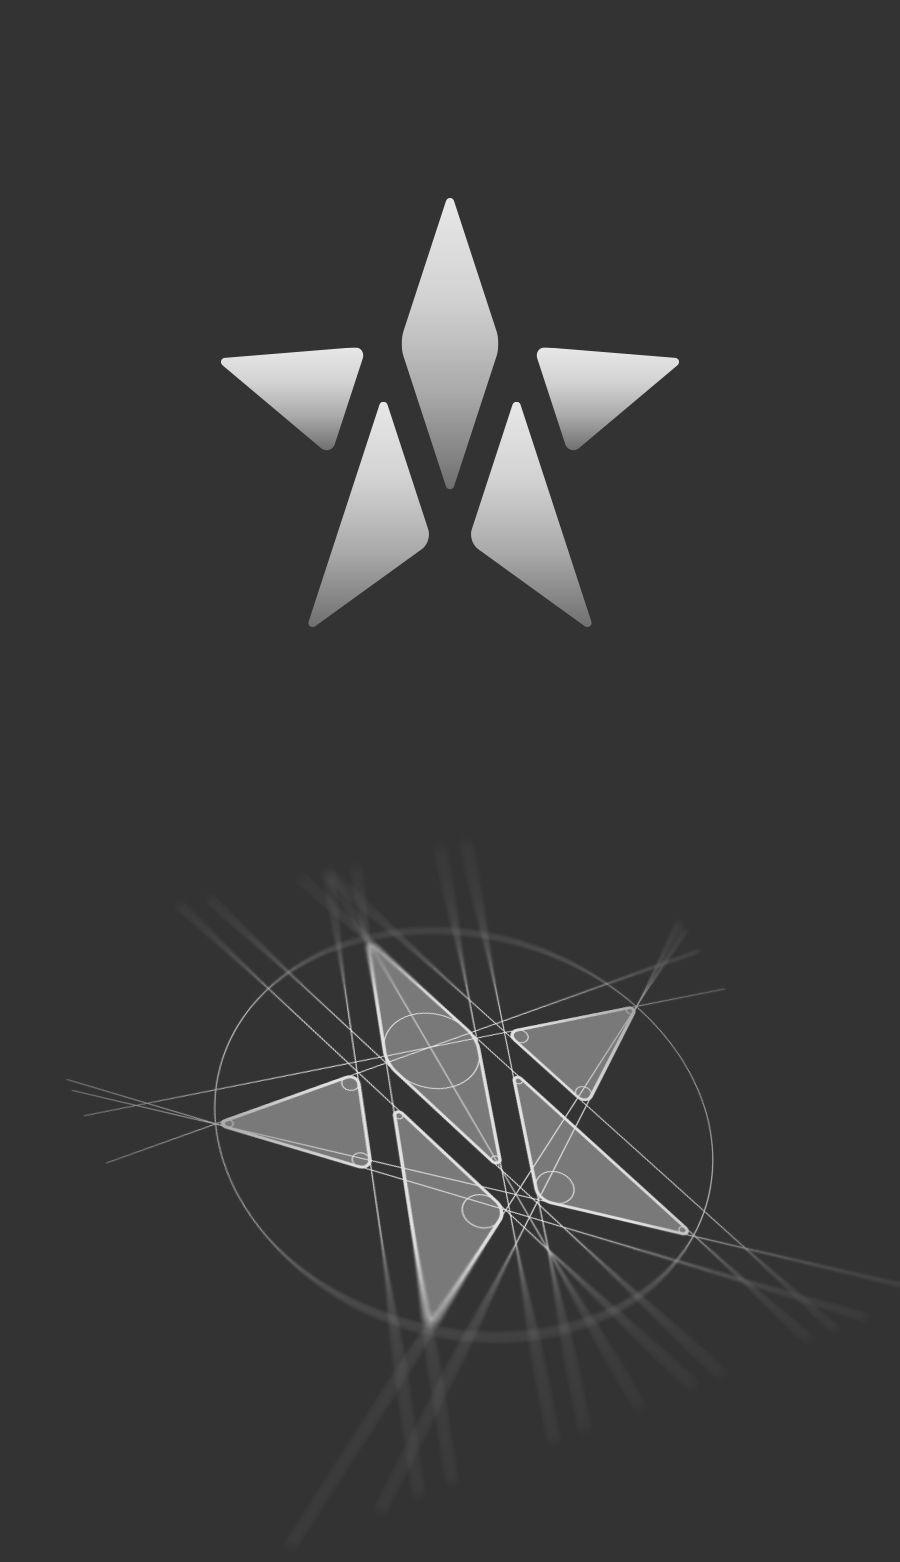 m star logo construction logo design by jan zabransky logo